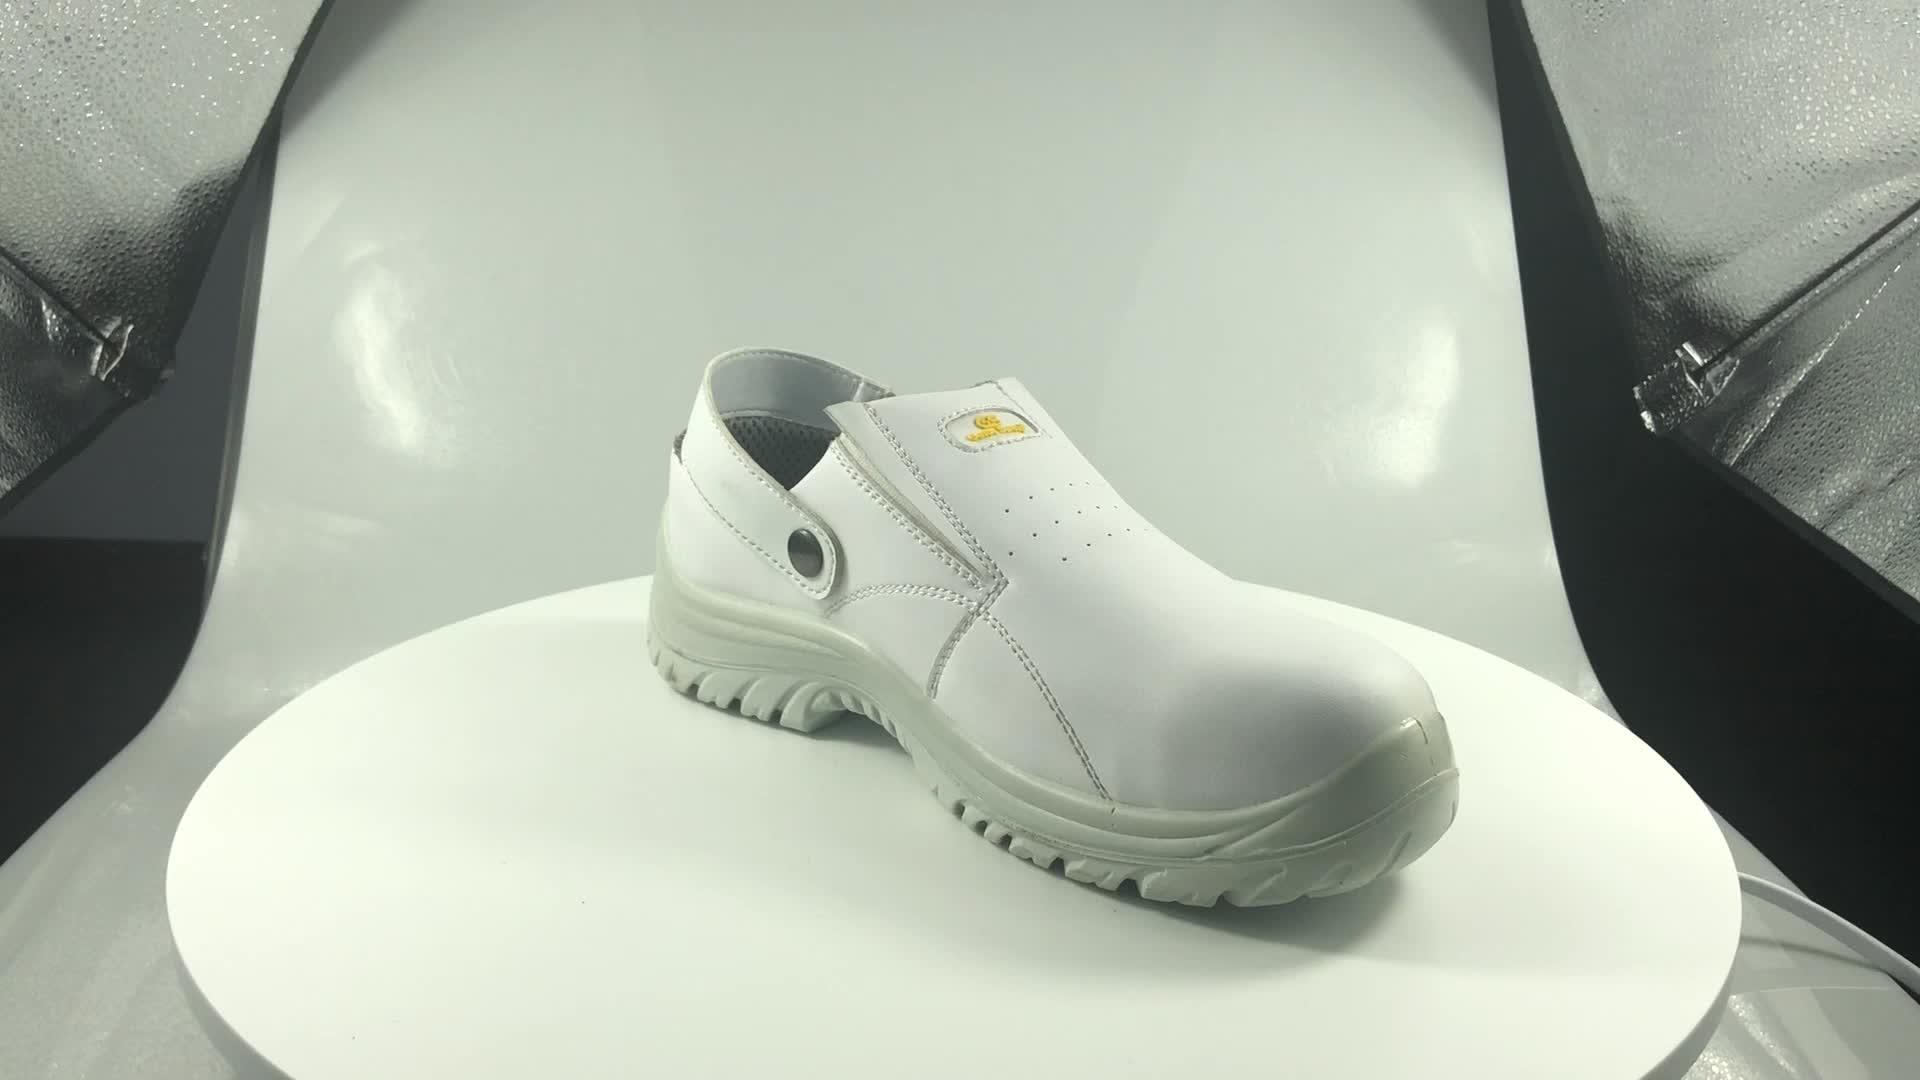 Branco antiderrapante calçados De Segurança Mid cut